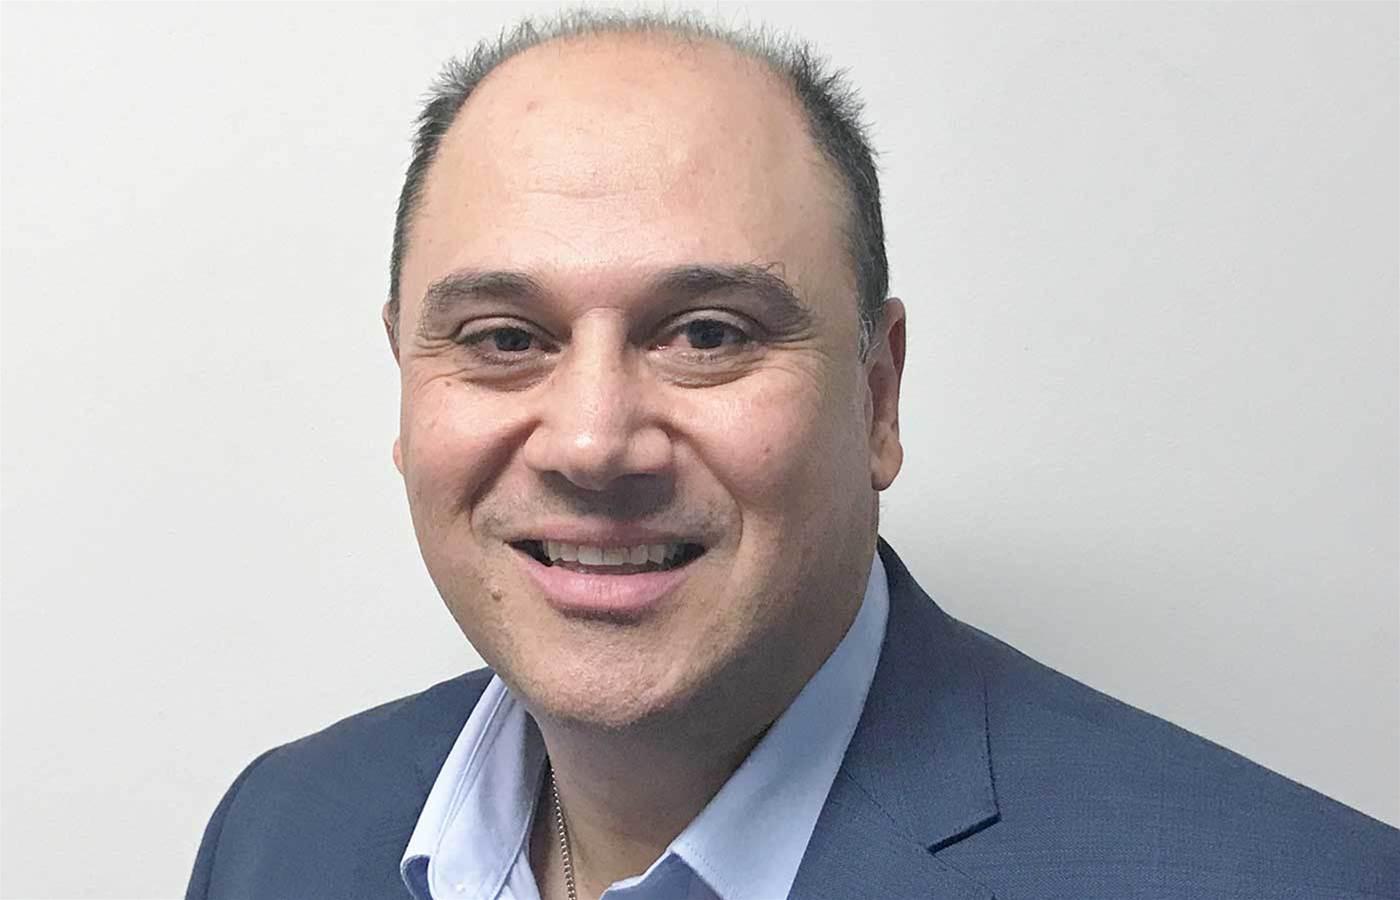 Fuji Xerox's Australian country manager jumps to OKI Data